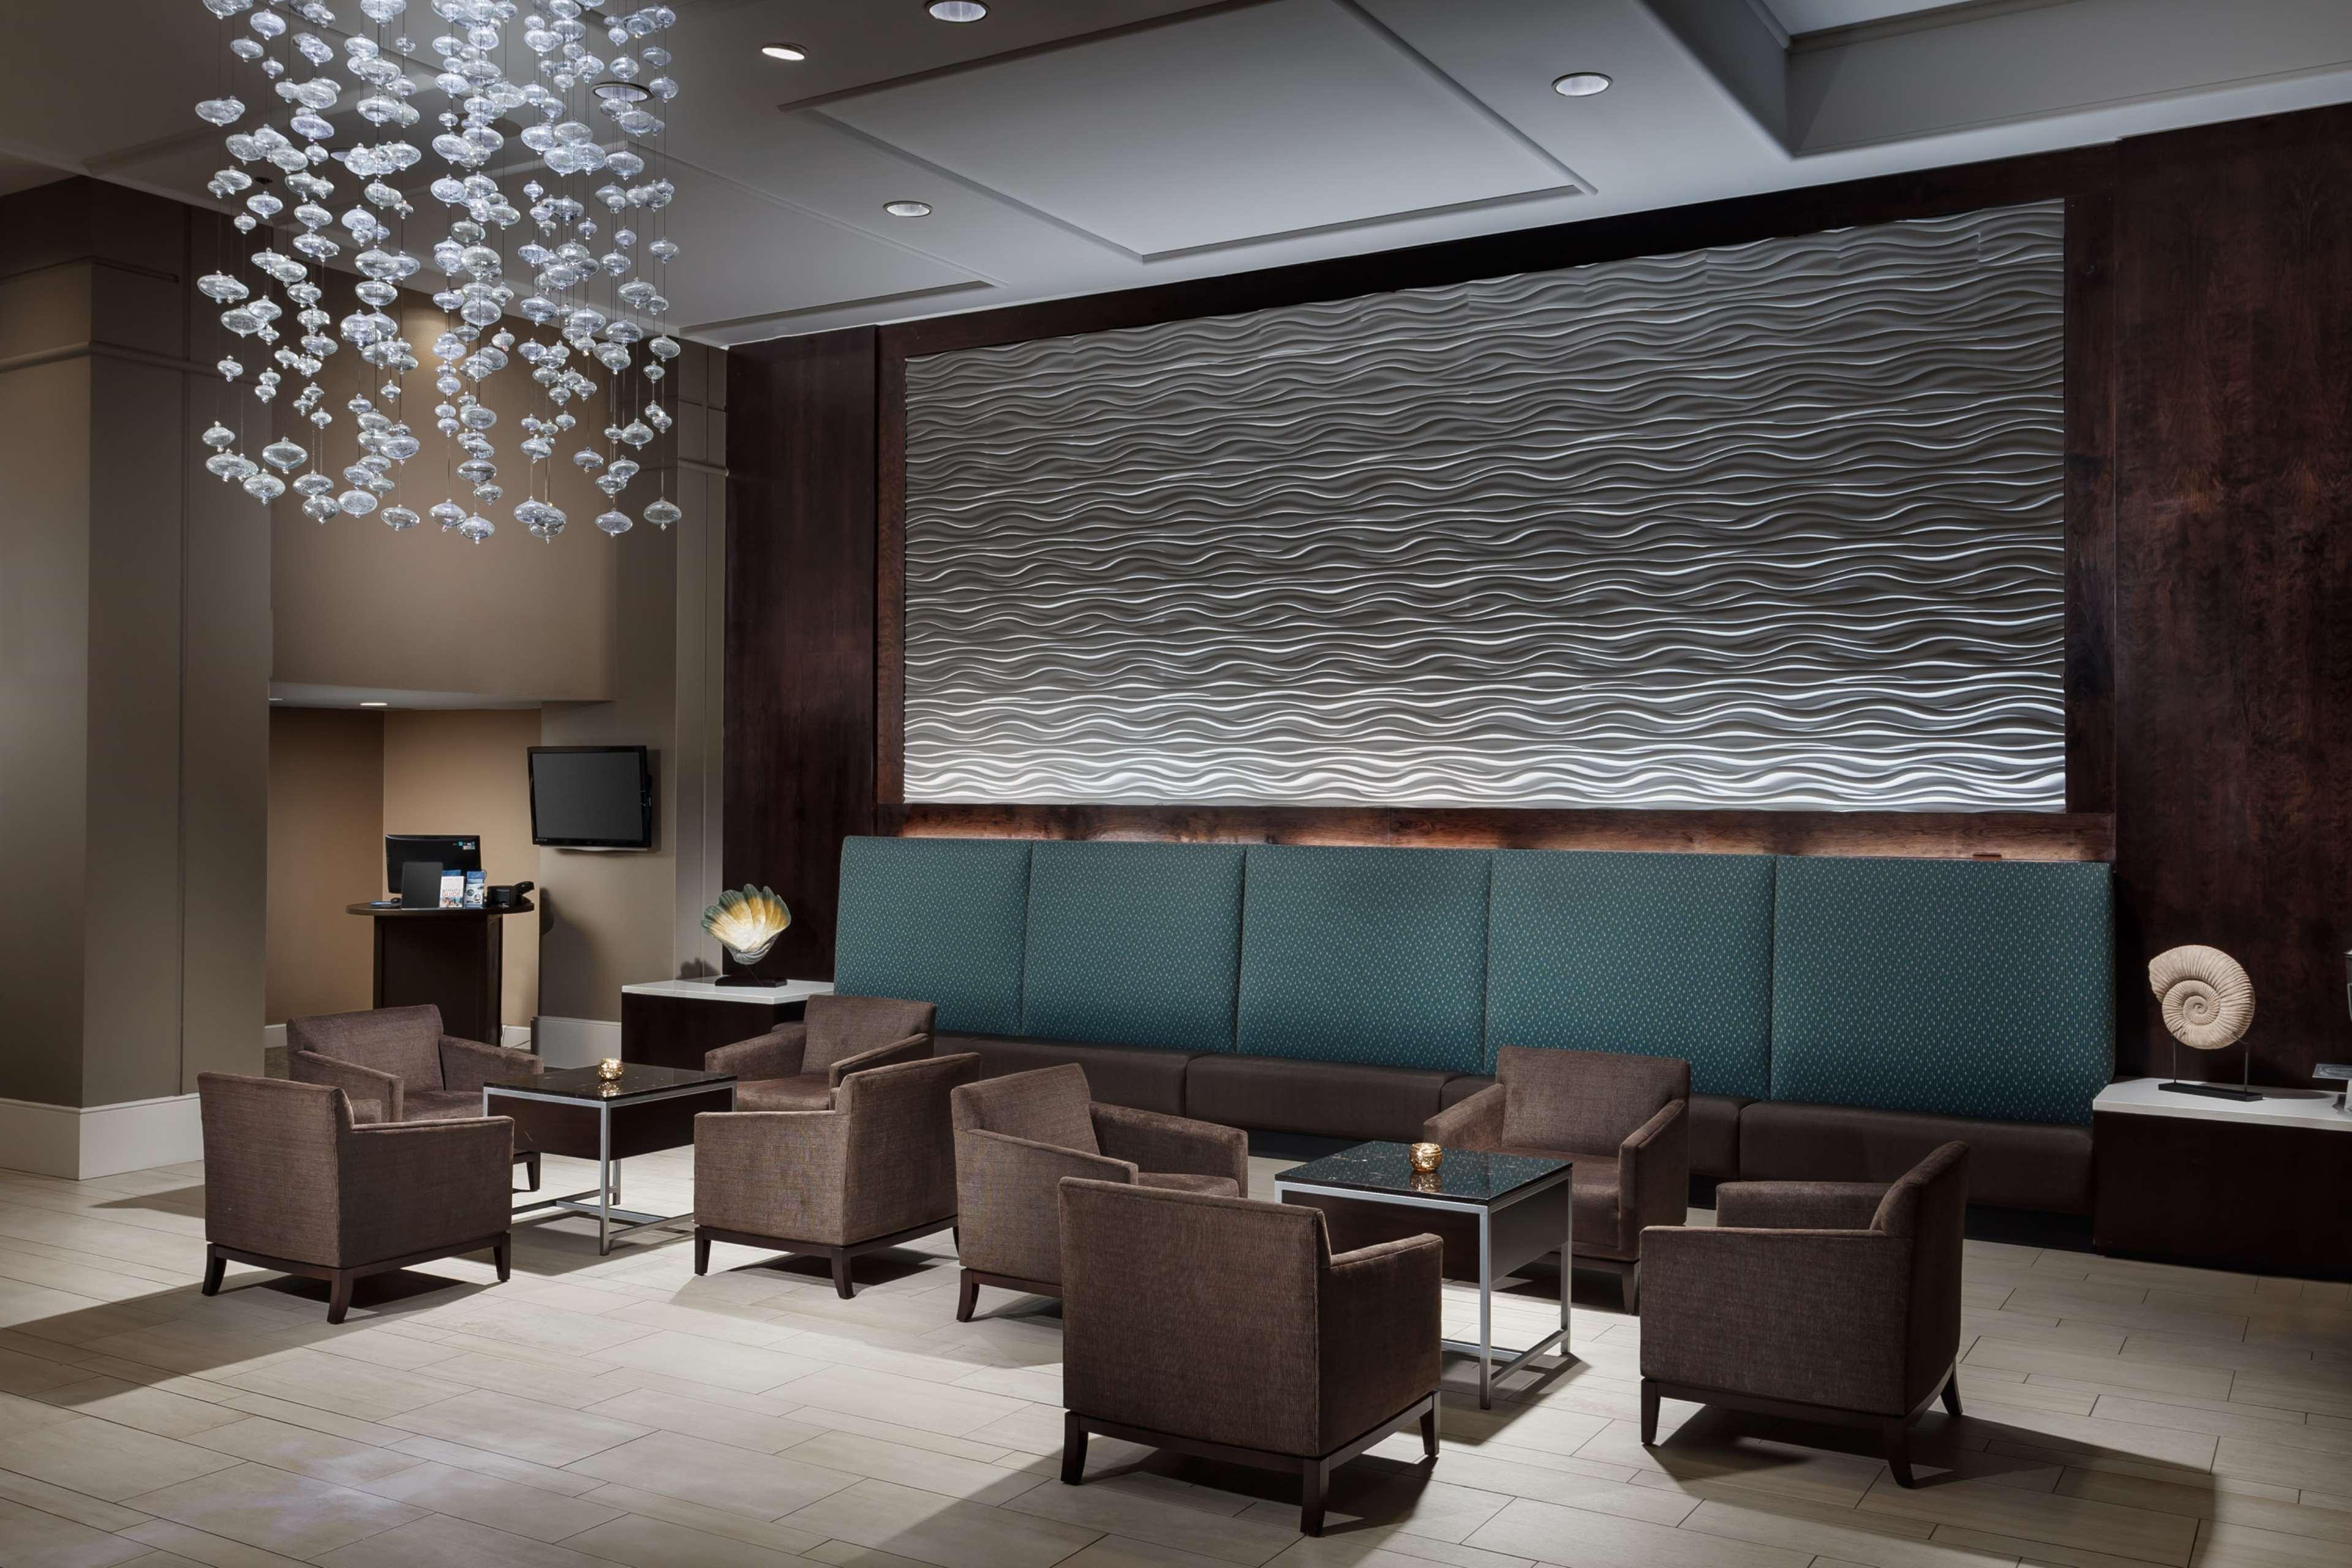 Embassy Suites by Hilton Orlando Lake Buena Vista Resort image 2